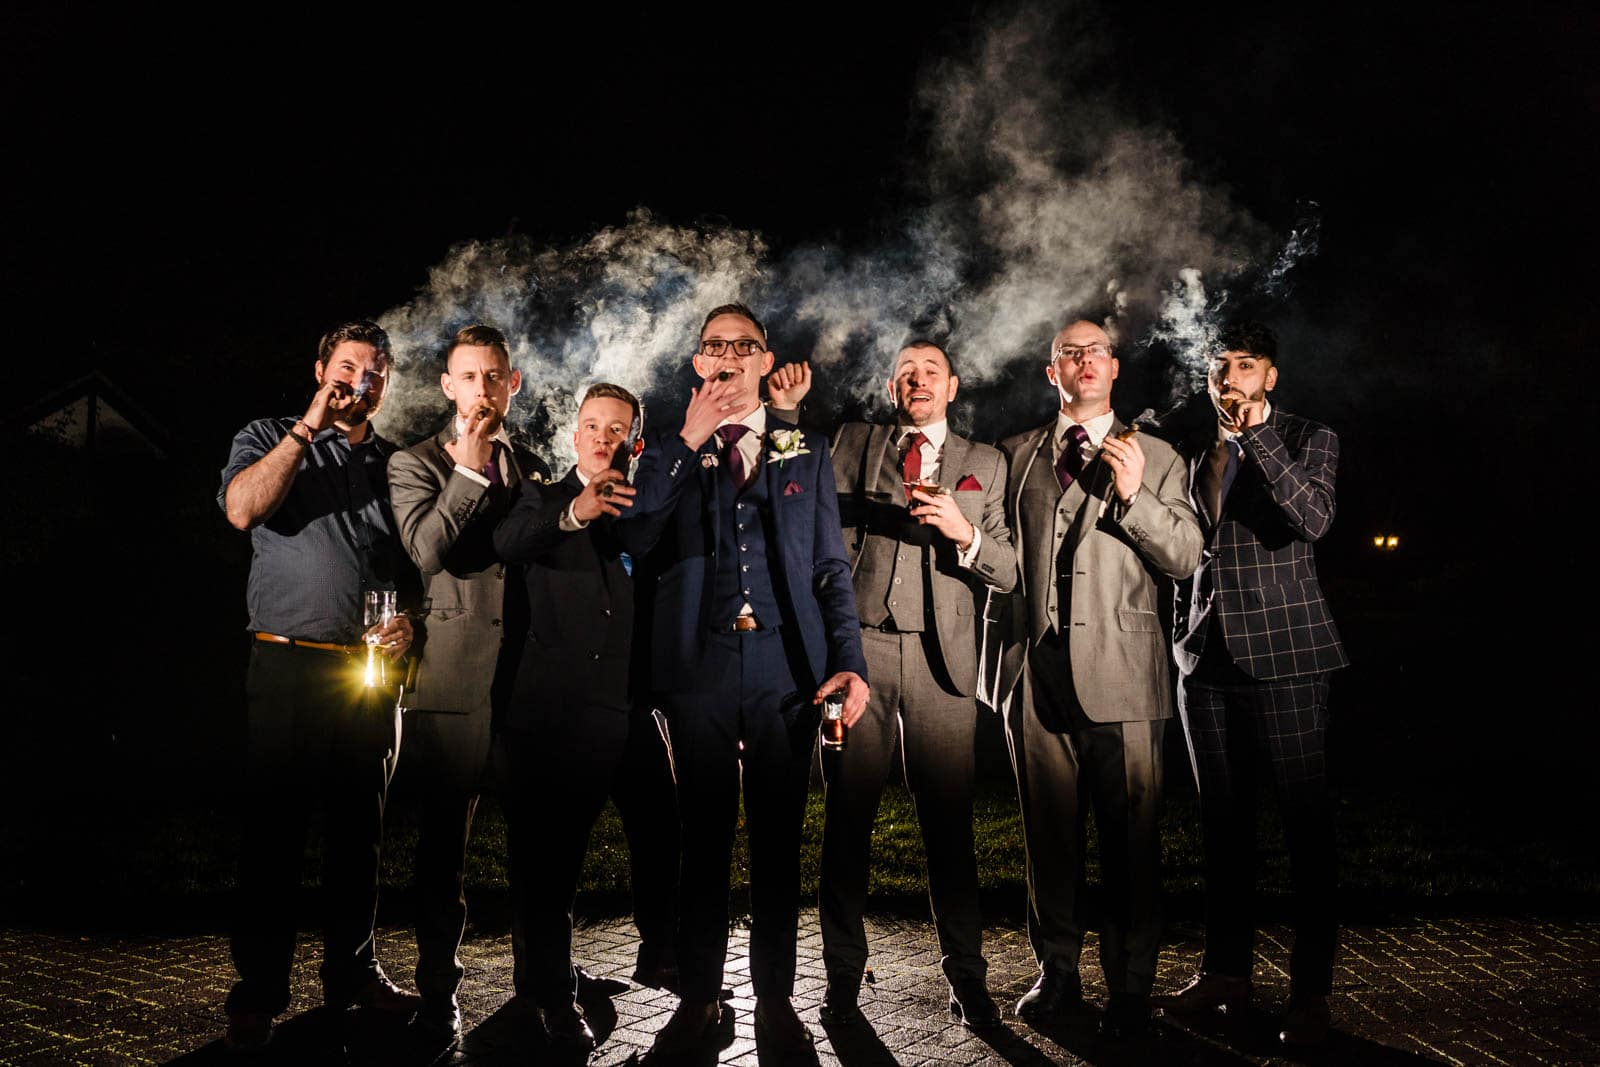 Milton Keynes Wedding Photographers - epic Off camera flash, groomsmen cigar photo using magmod and godox flashes